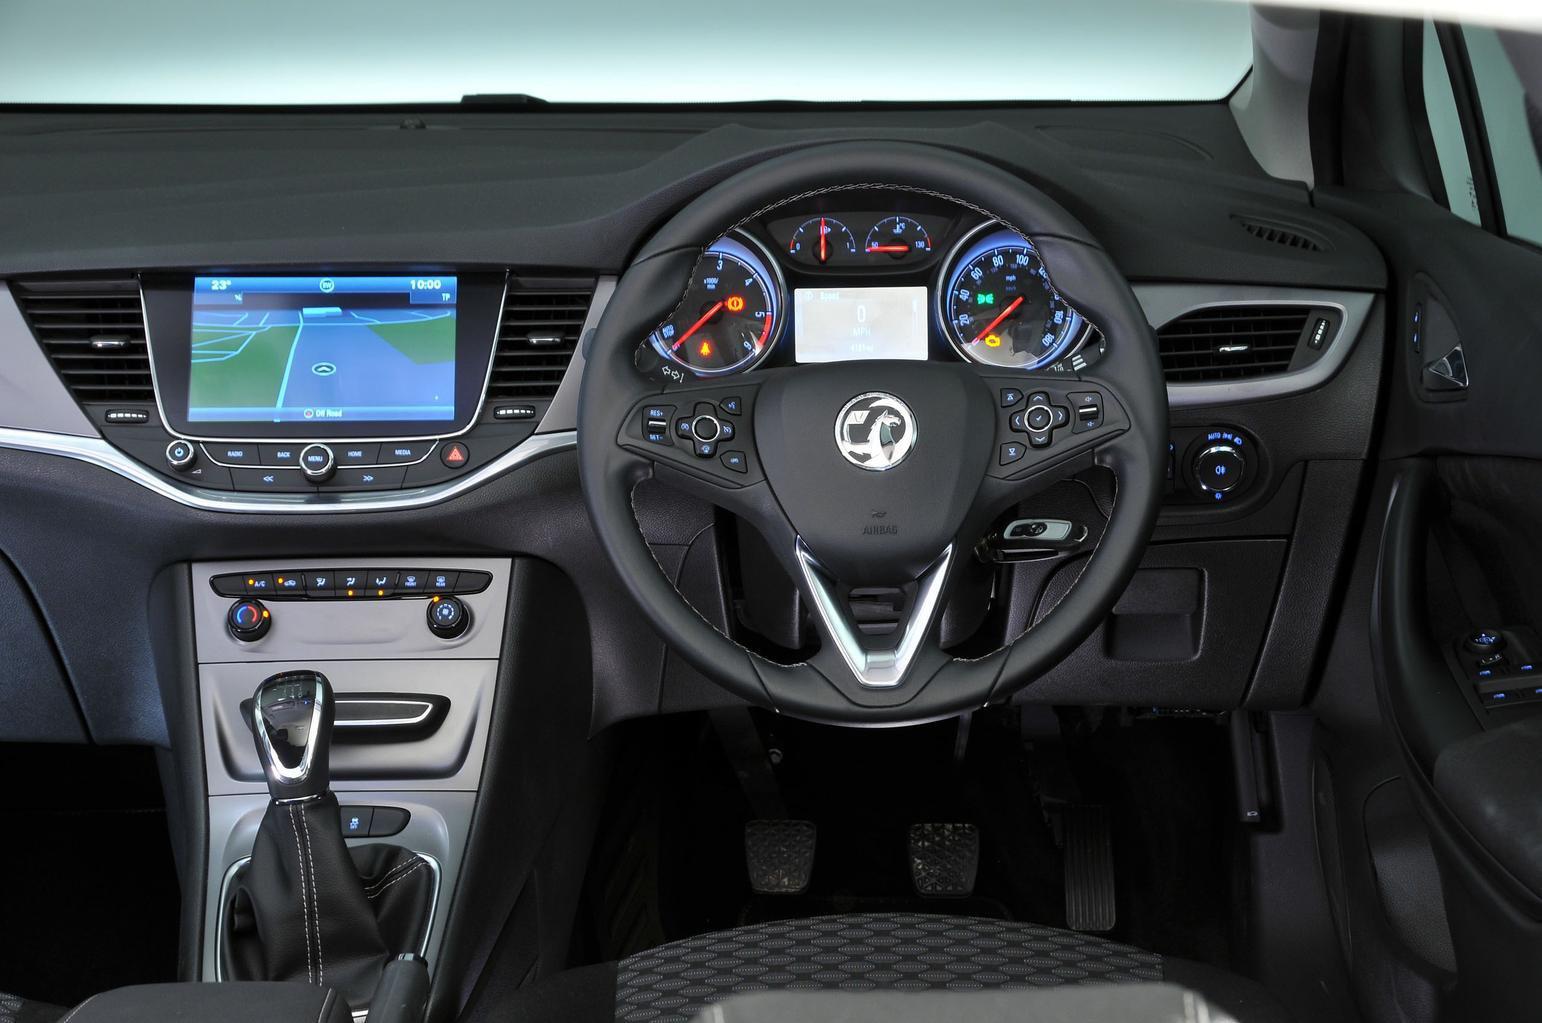 2016 Vauxhall Astra 1.6 CDTi 110 Ecoflex review